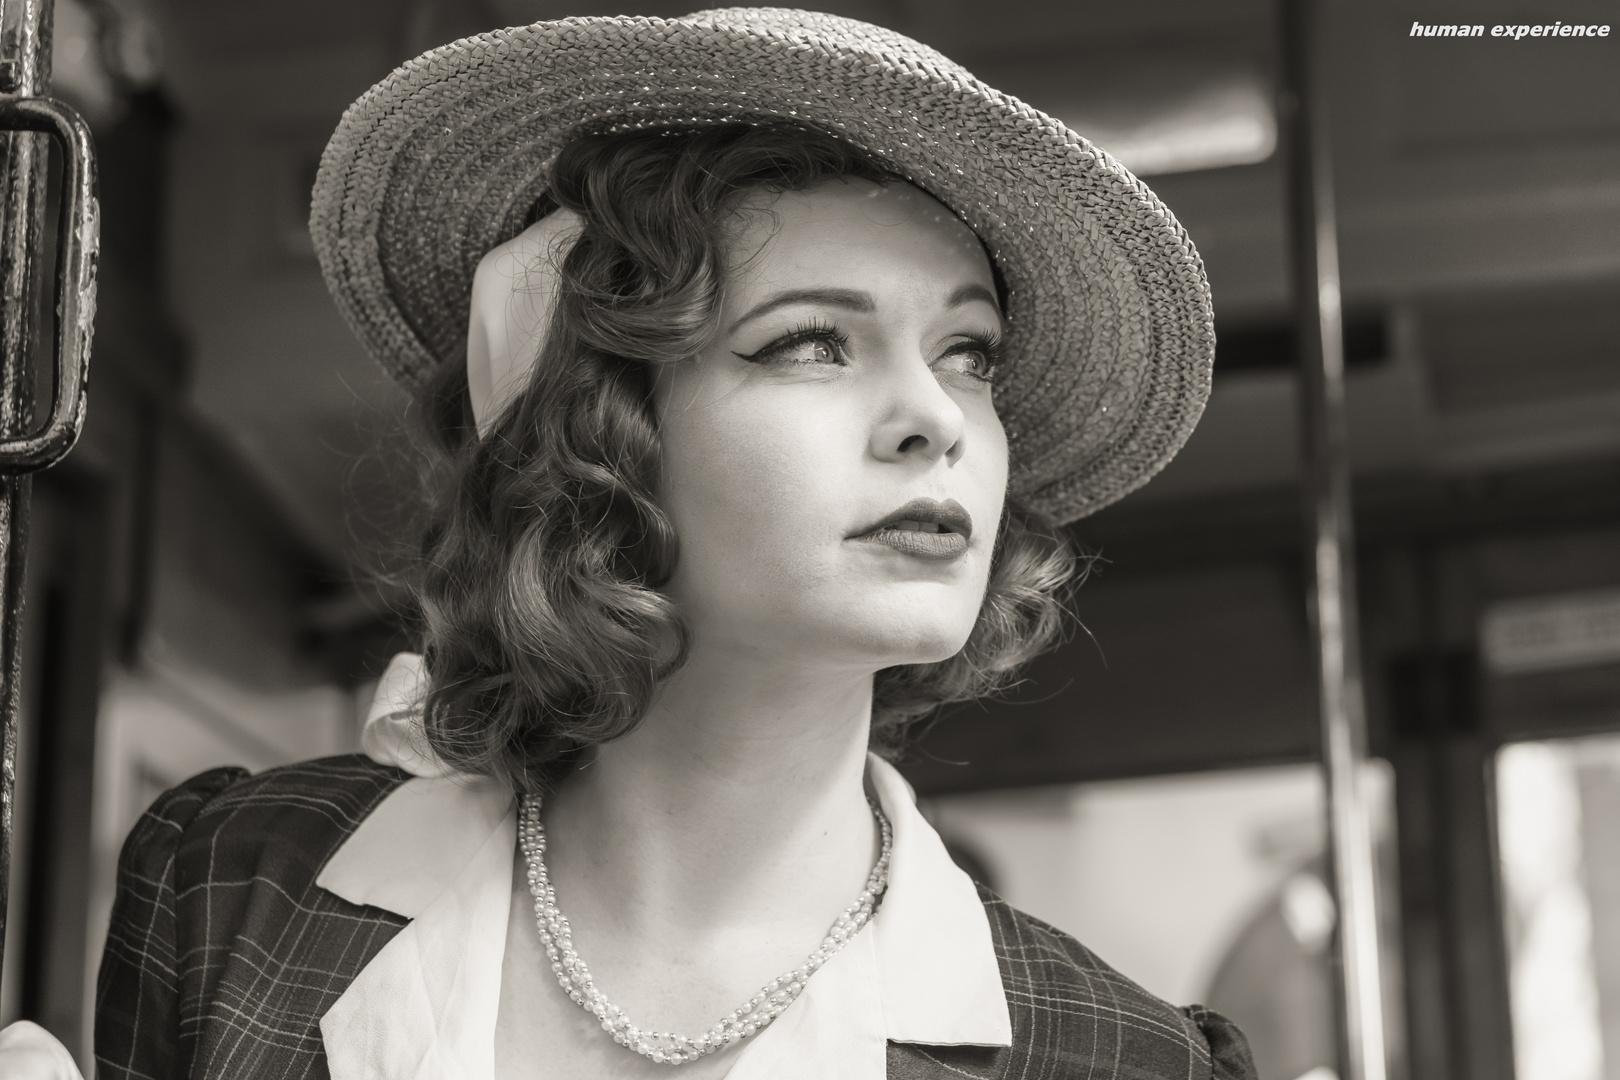 Miss Catalina Rose